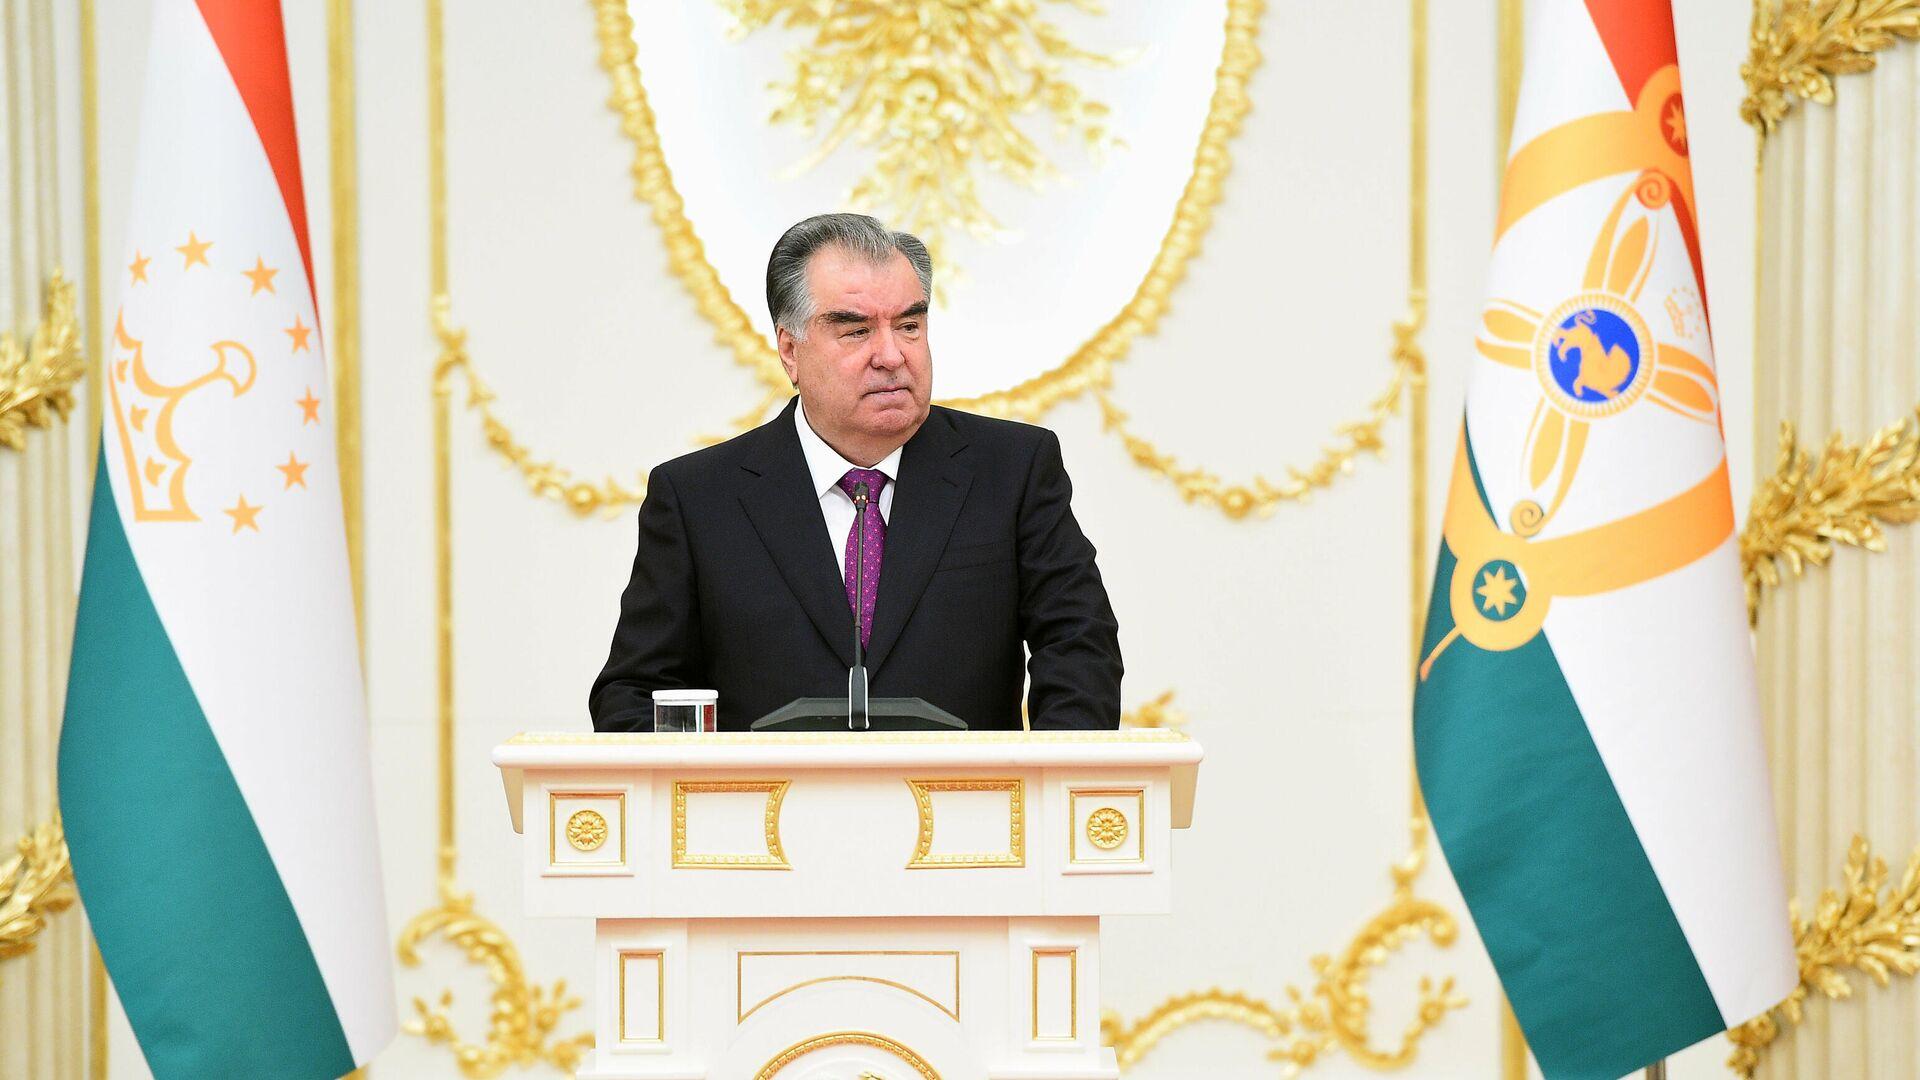 Президент Республики Таджикистан Эмомали Рахмон - Sputnik Таджикистан, 1920, 02.09.2021